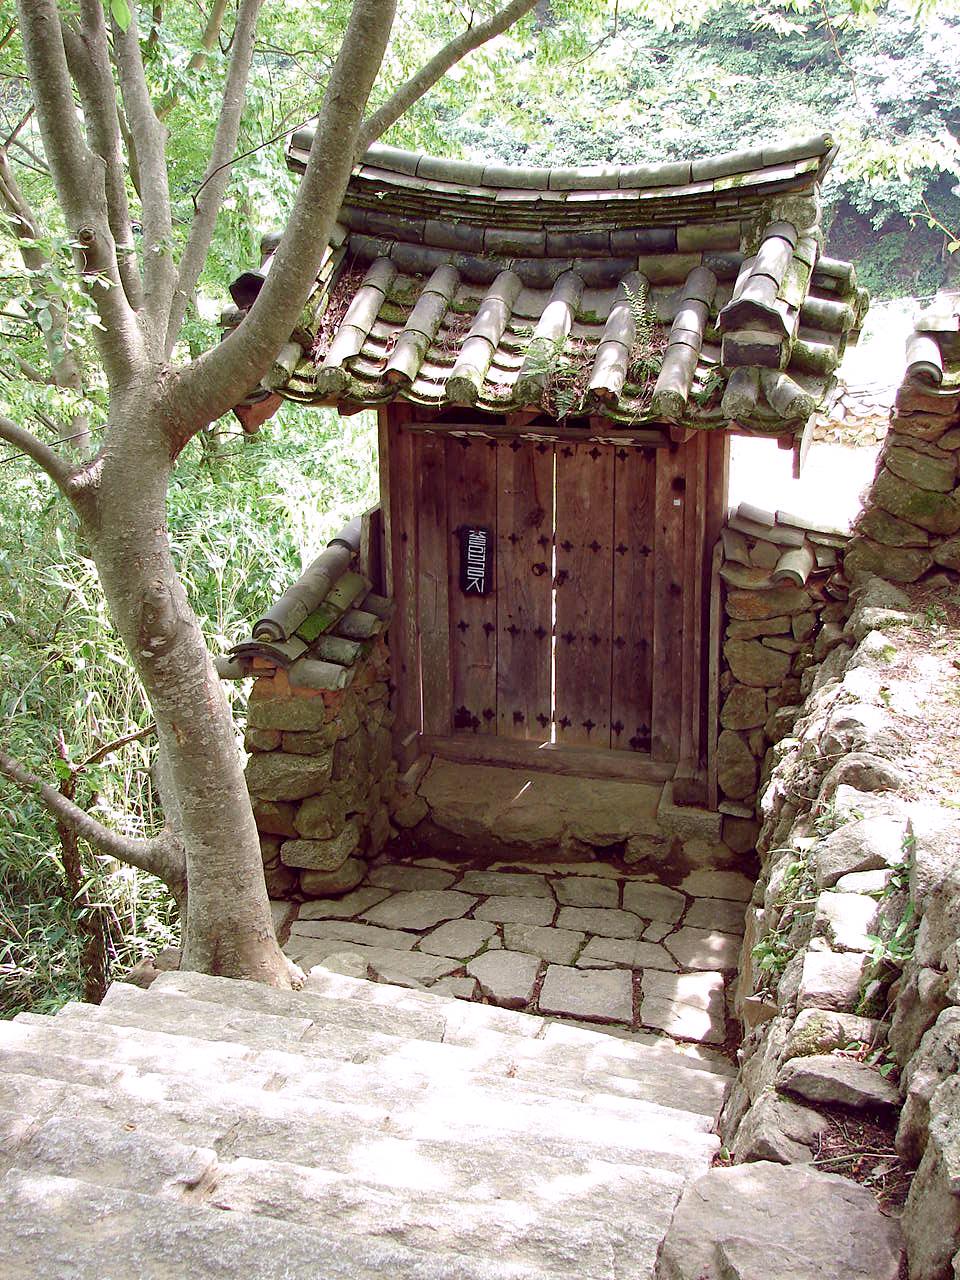 Korea-Hwaeomsa_62.jpg